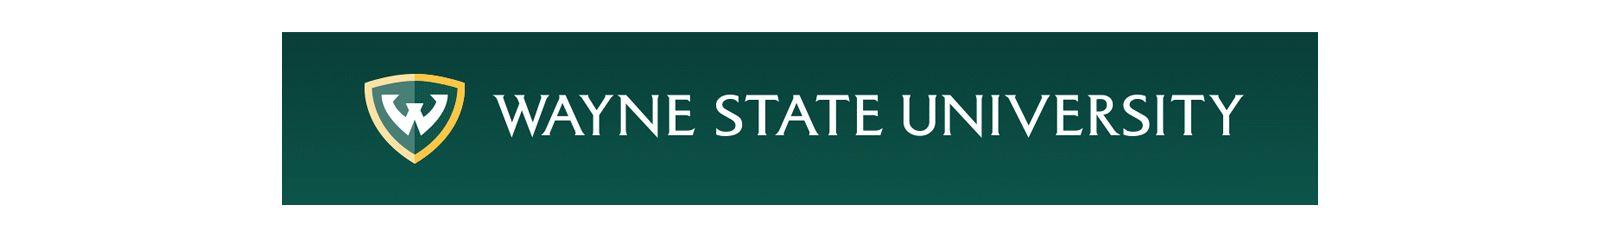 wayne-state-header